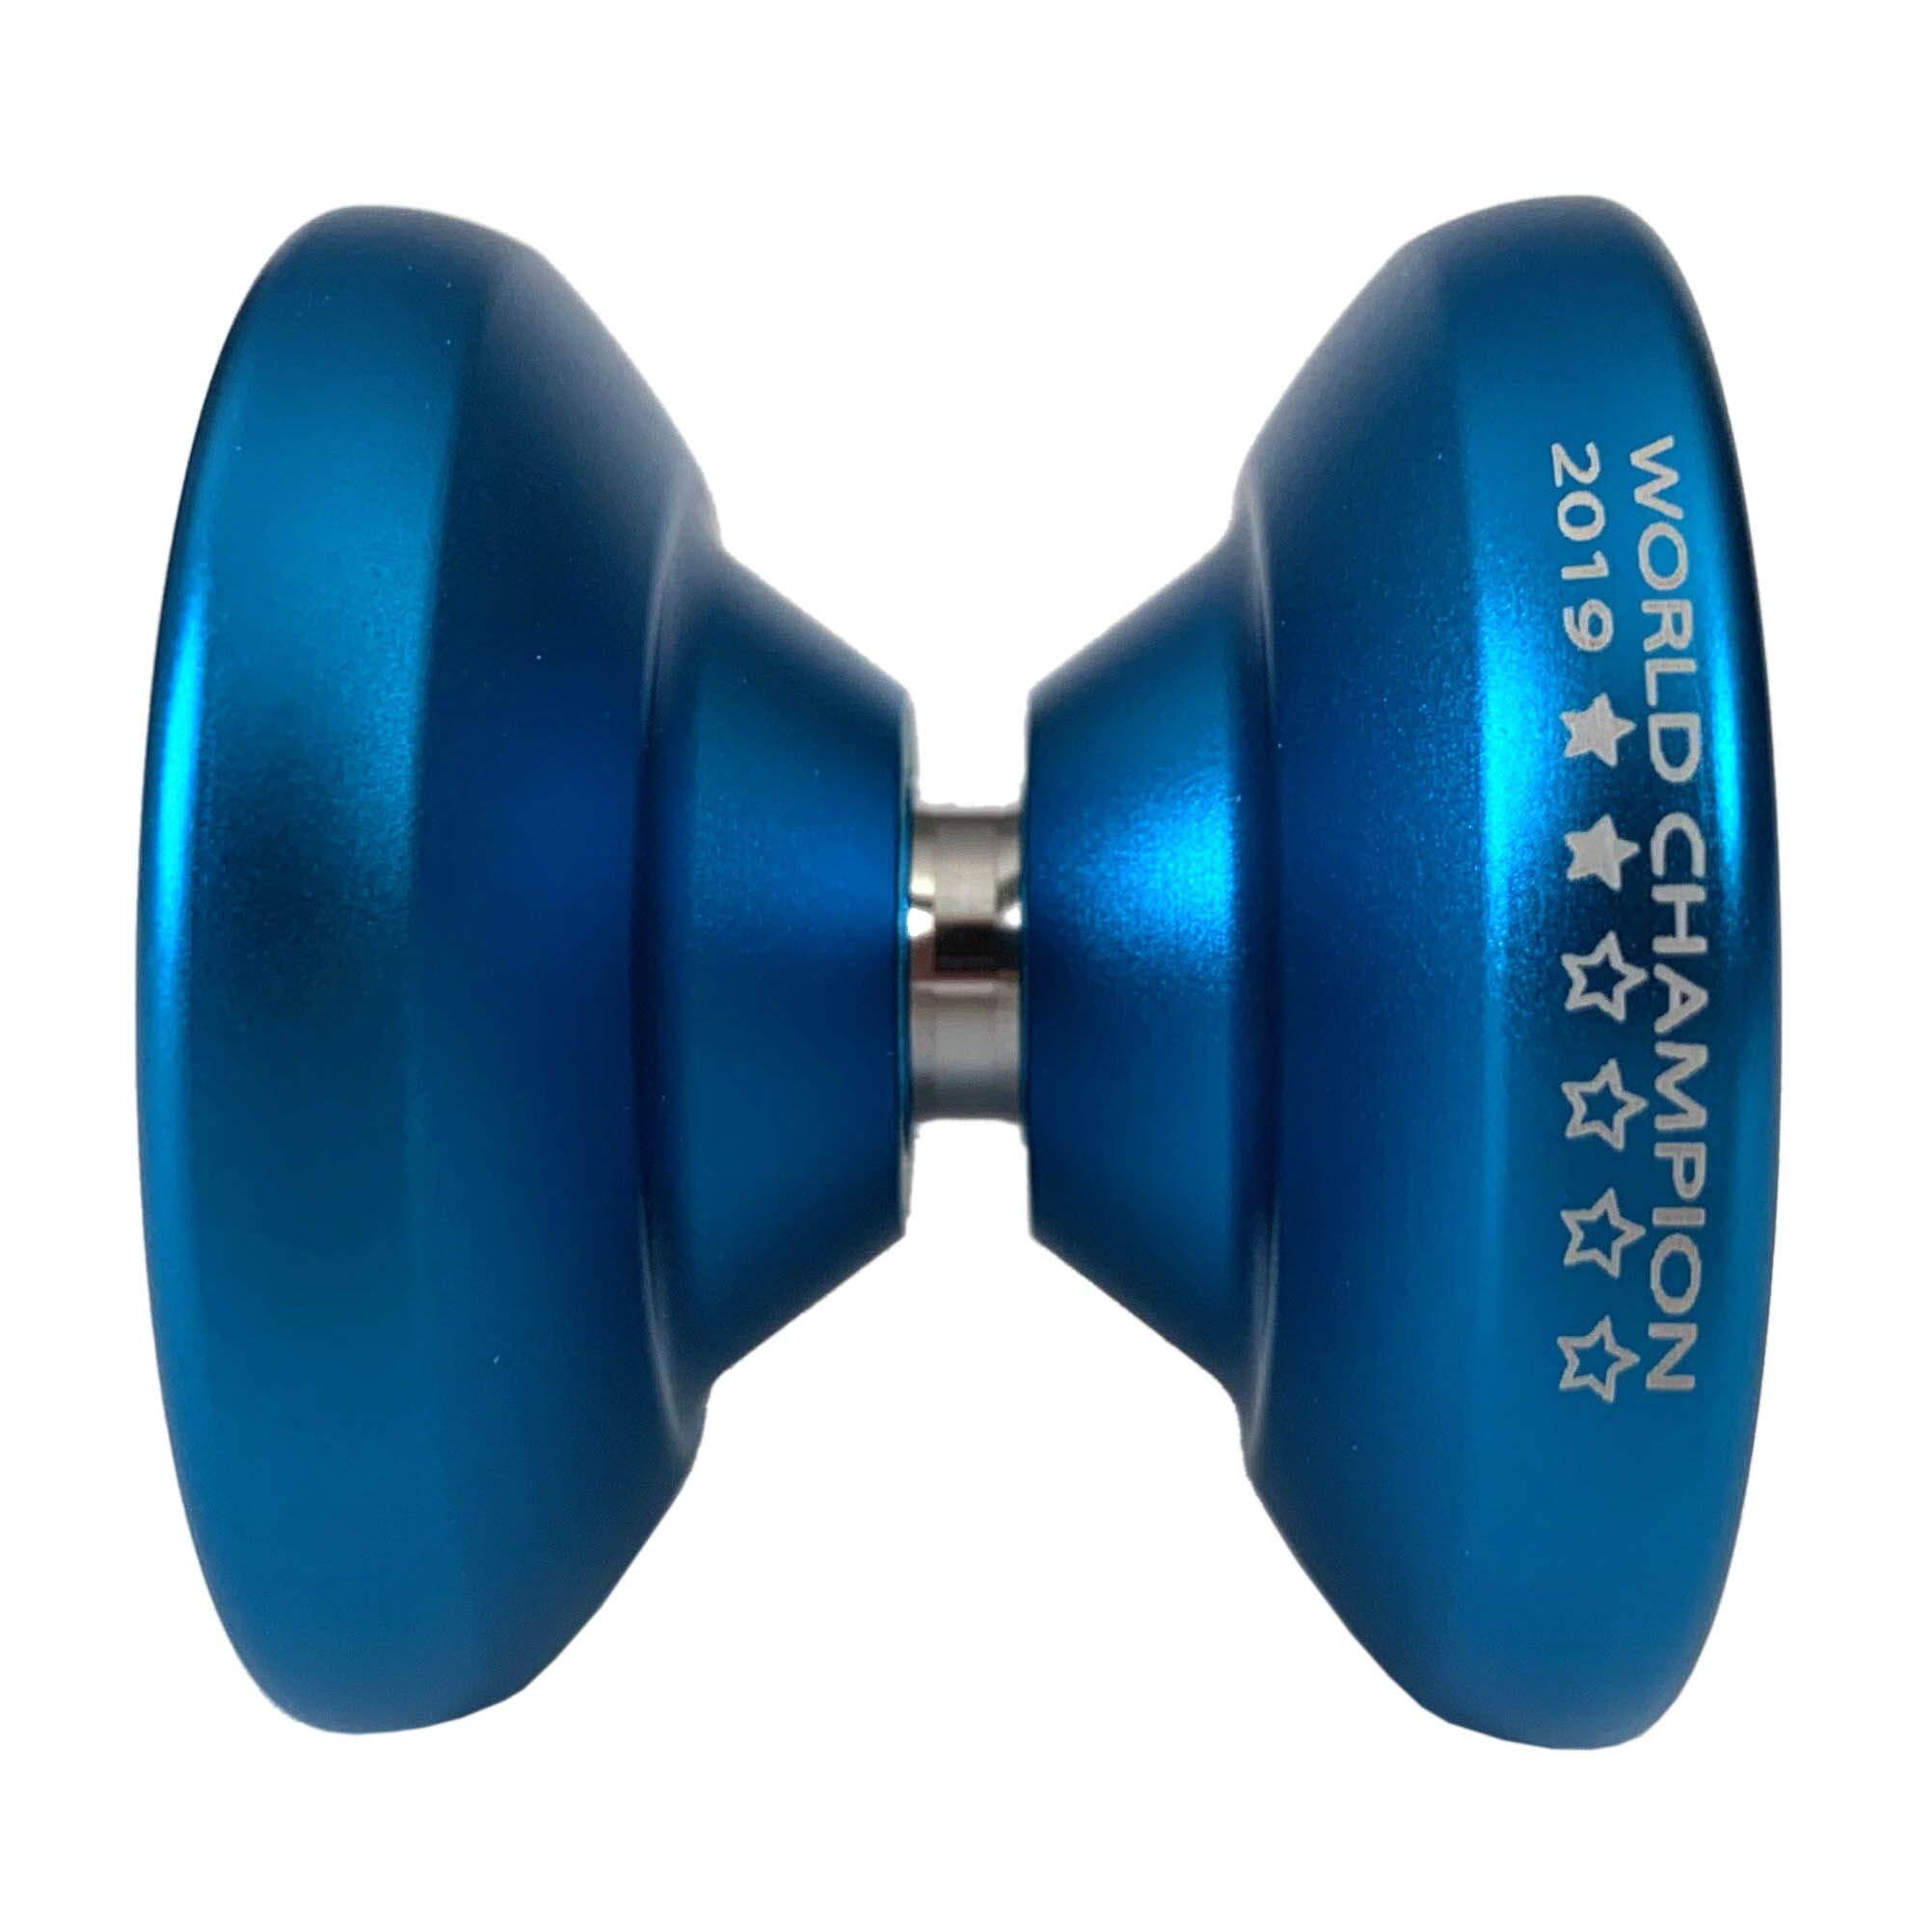 YoYoFactory World Champion Shutter Wide Angle Yoyo Color Aqua Collectible by YoYoFactory